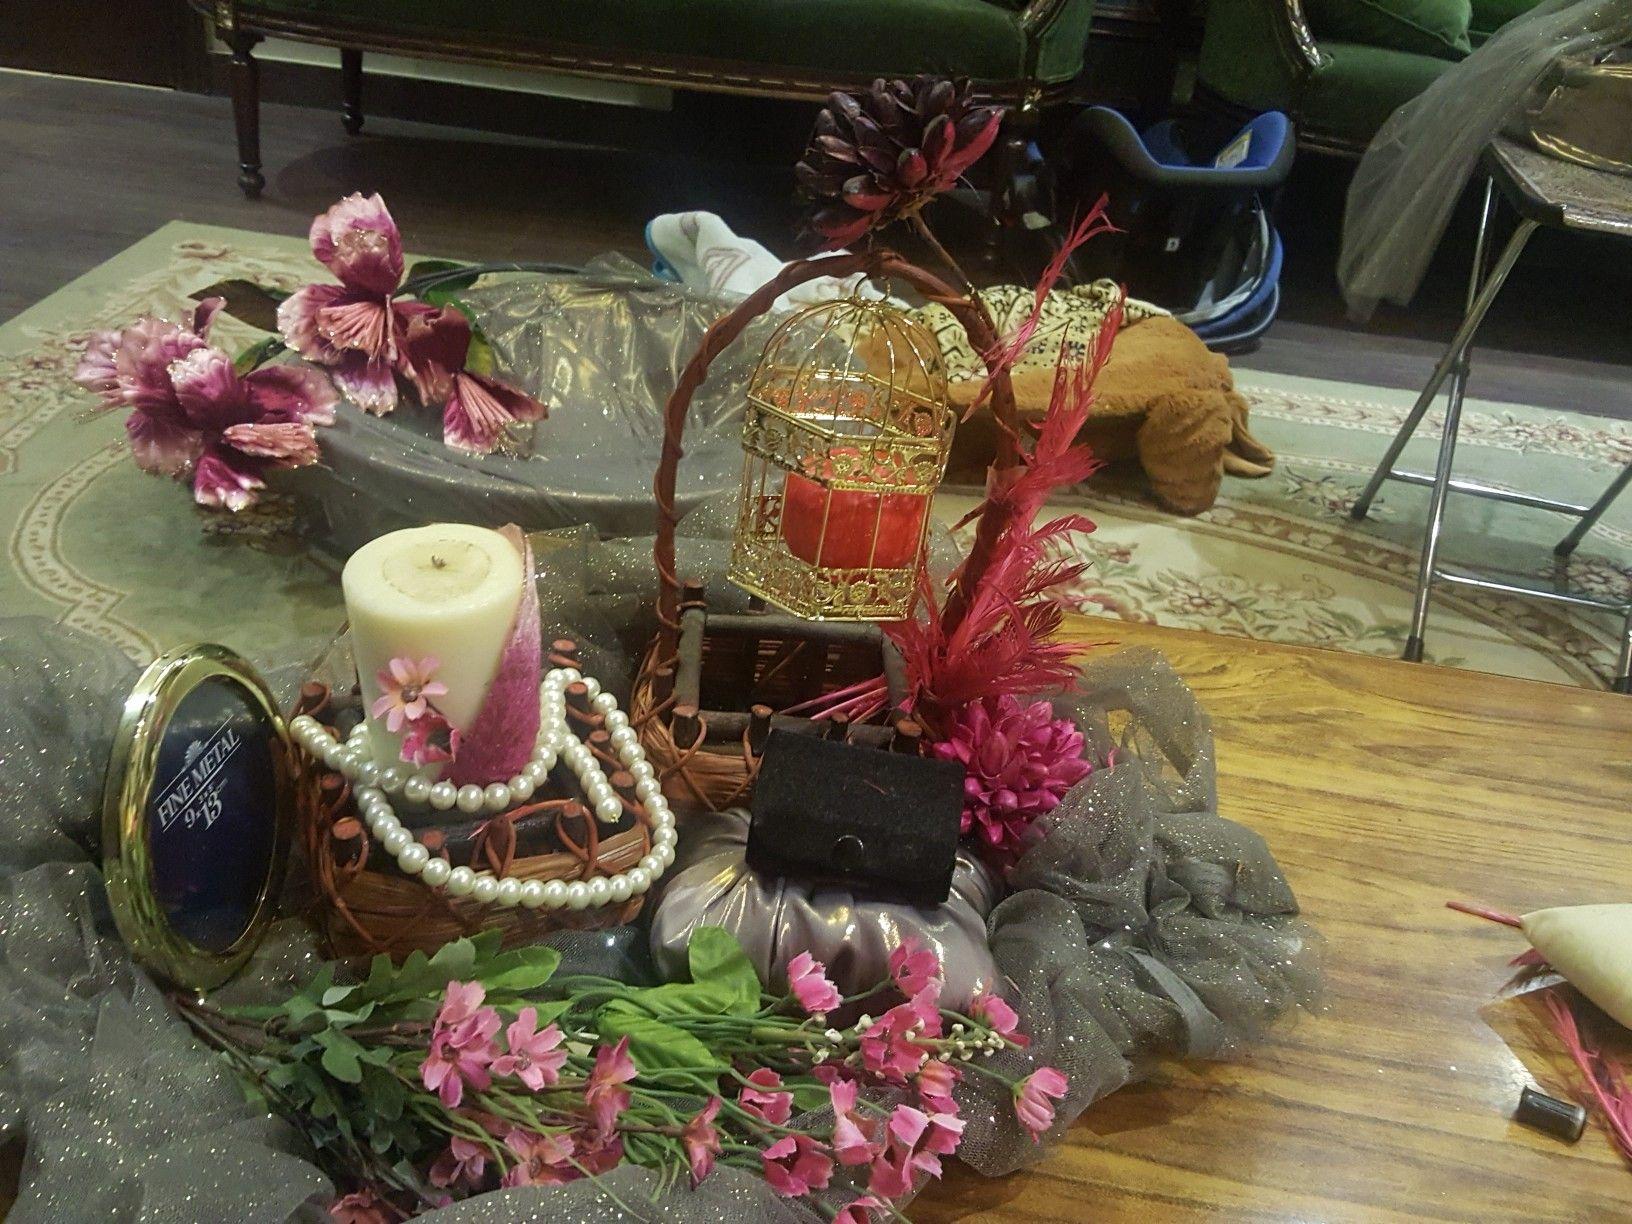 Wedding tray decoration ideas  Pin by Nida Fatima on engagement gift basket and platter  Pinterest